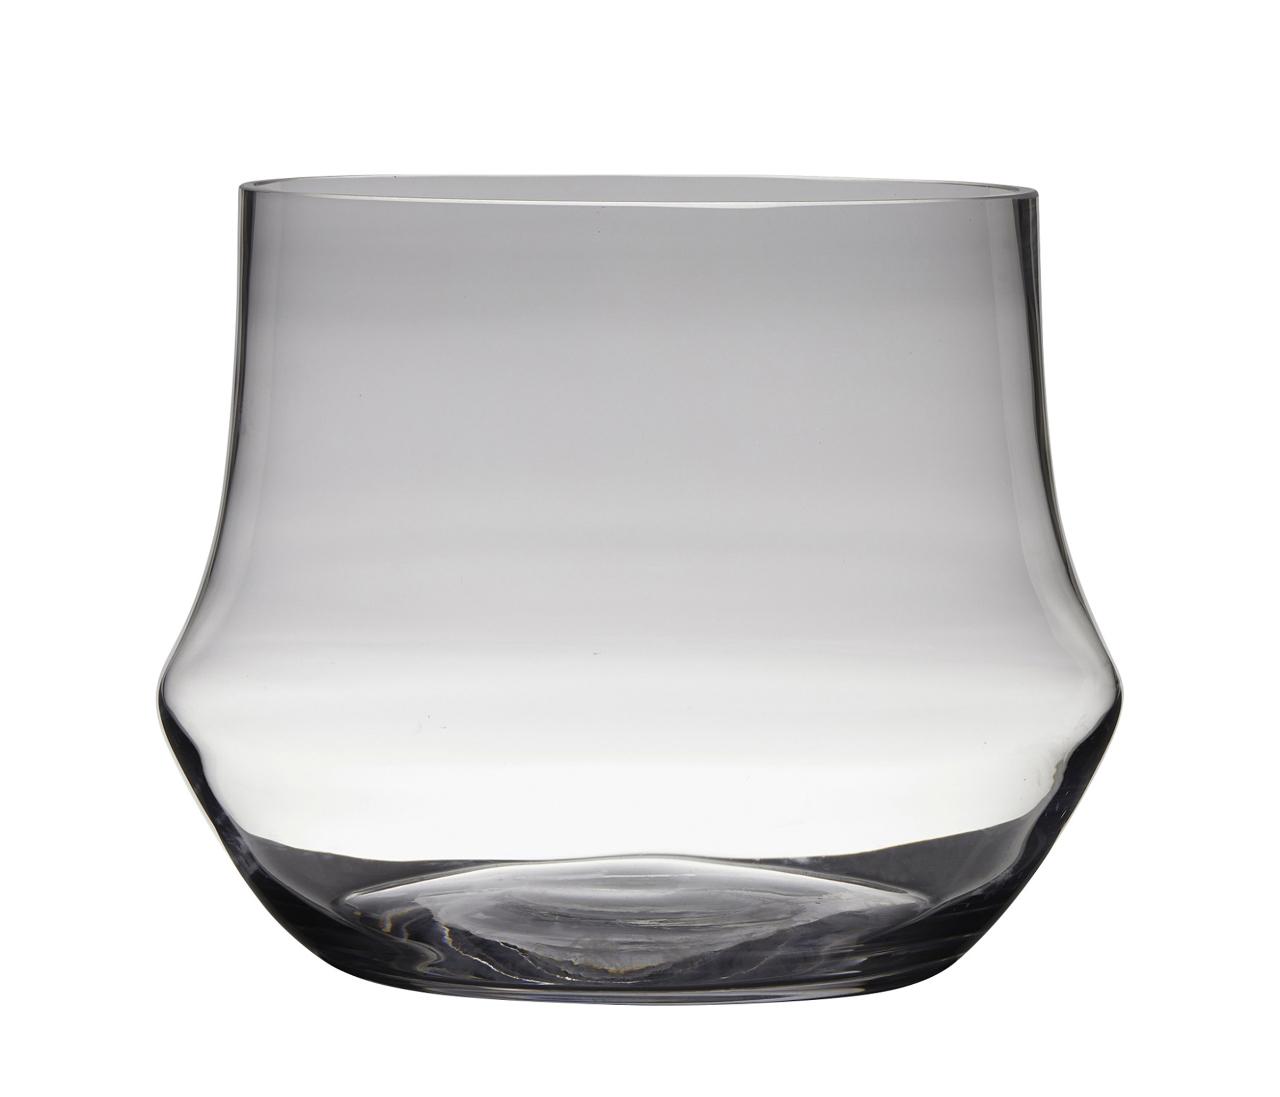 Tokyo Glass Vase Medium | alvaluz.com